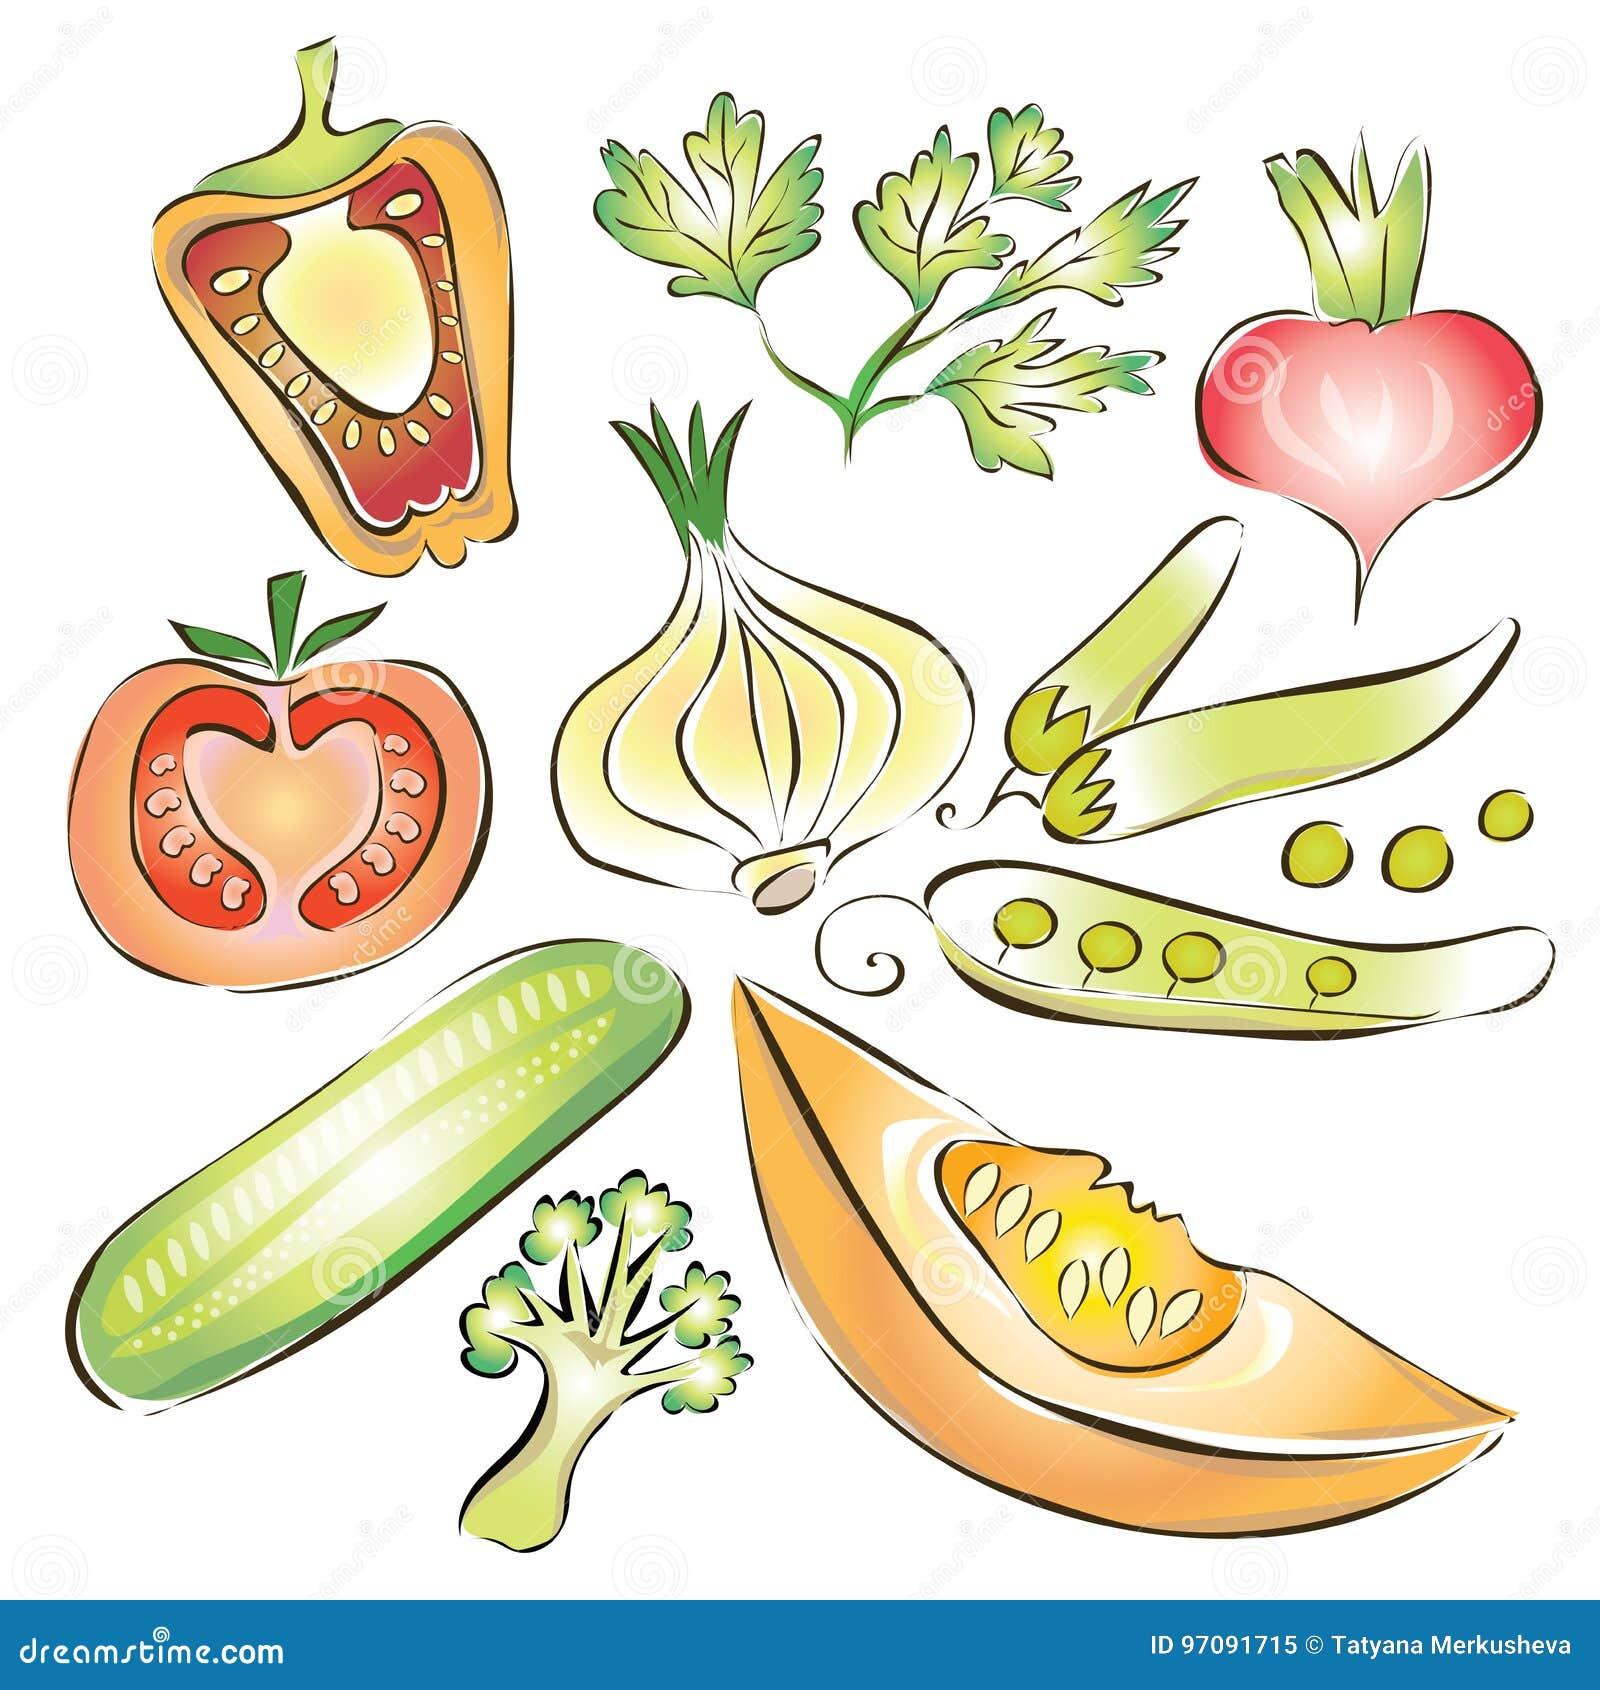 Tomaten, Champignon, Gurken, Kohl, Rettiche, Kopfsalat und grüne Zwiebeln Pfeffer, Gurke, Zwiebel